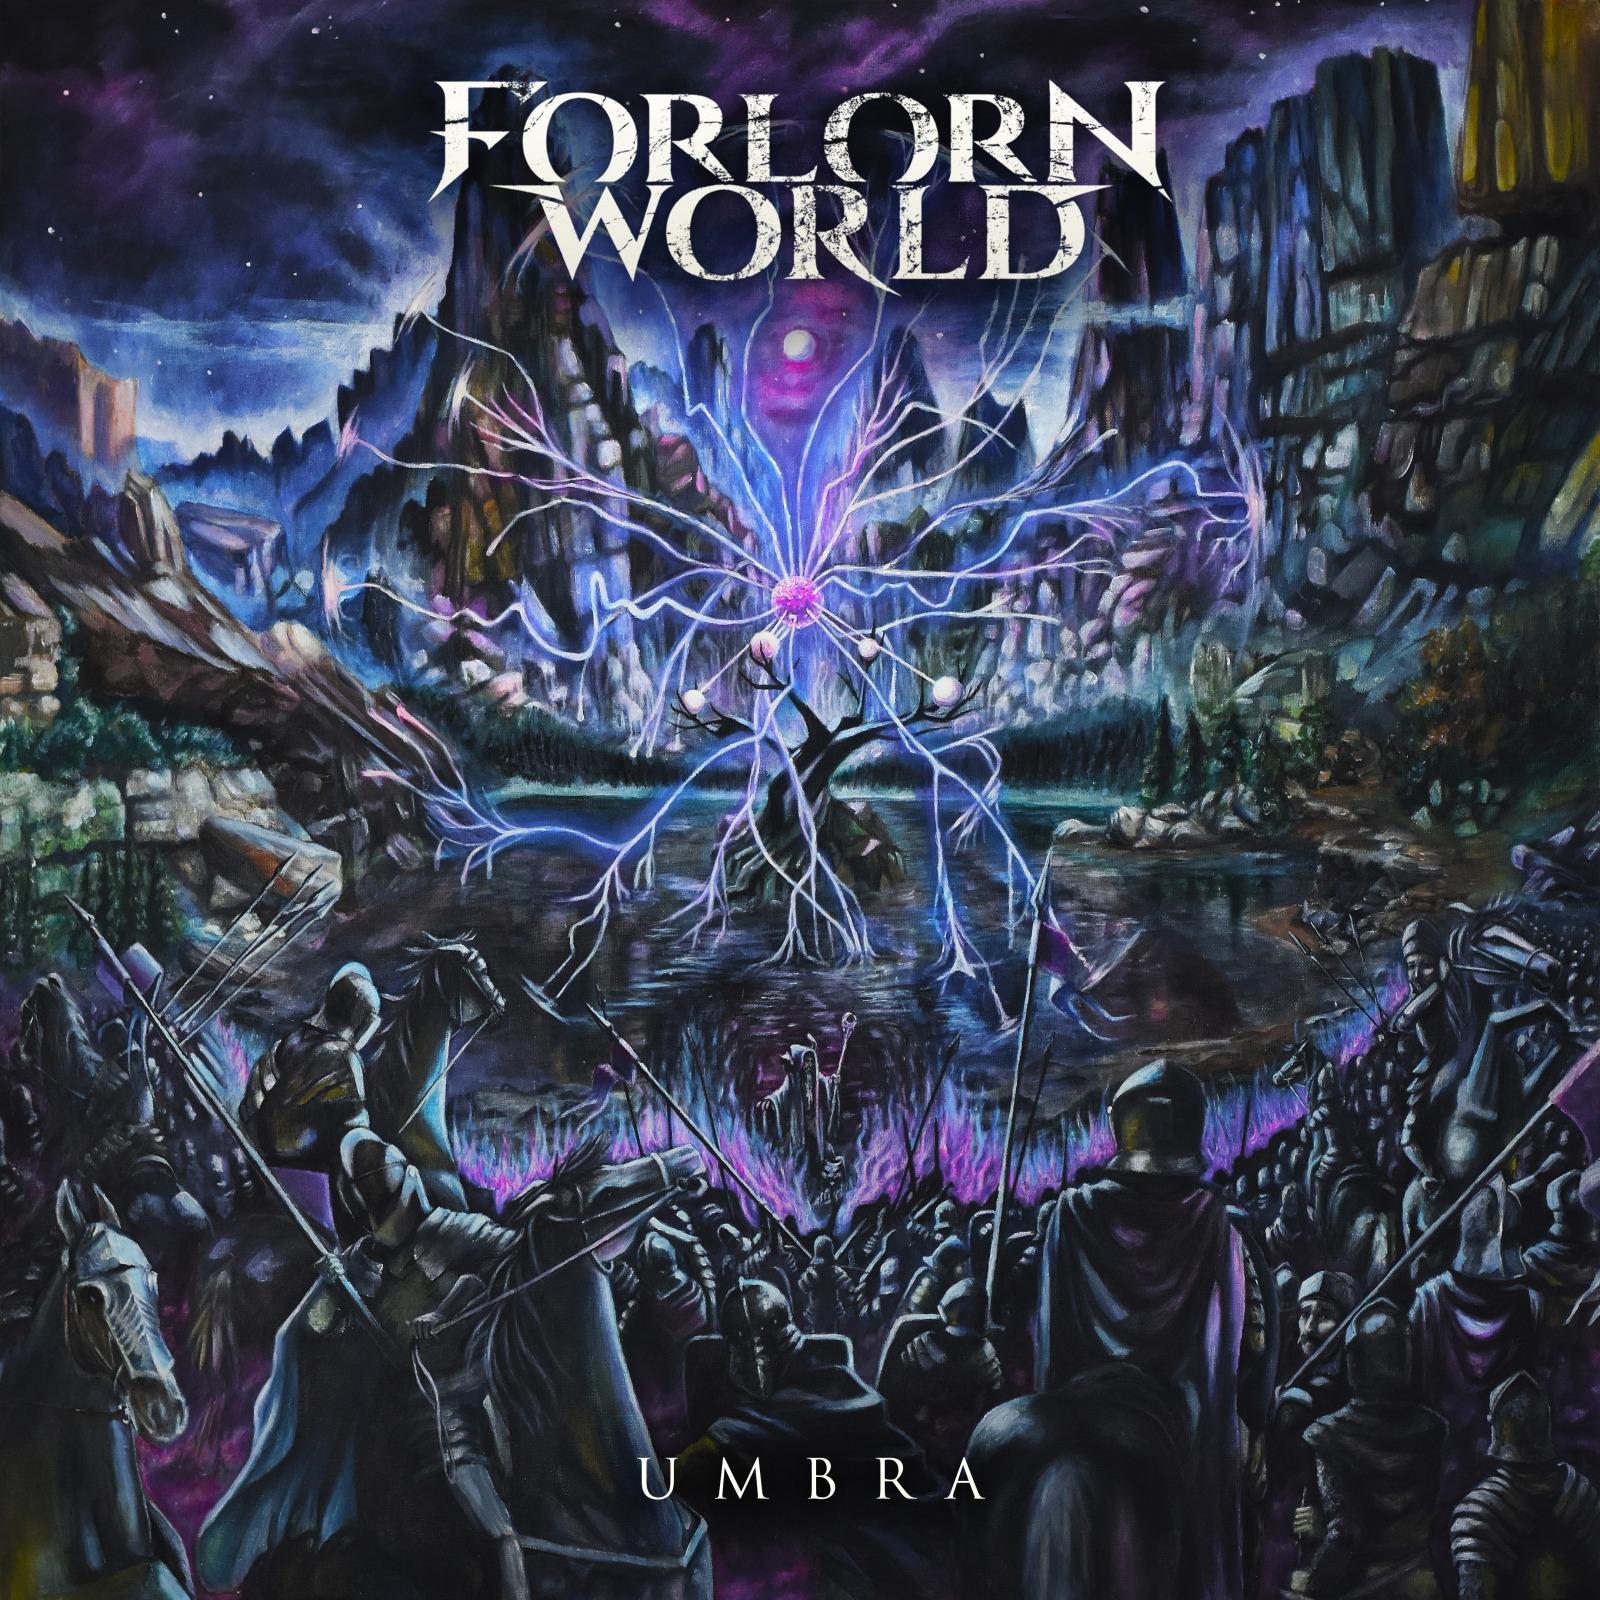 Forlorn World – Umbra